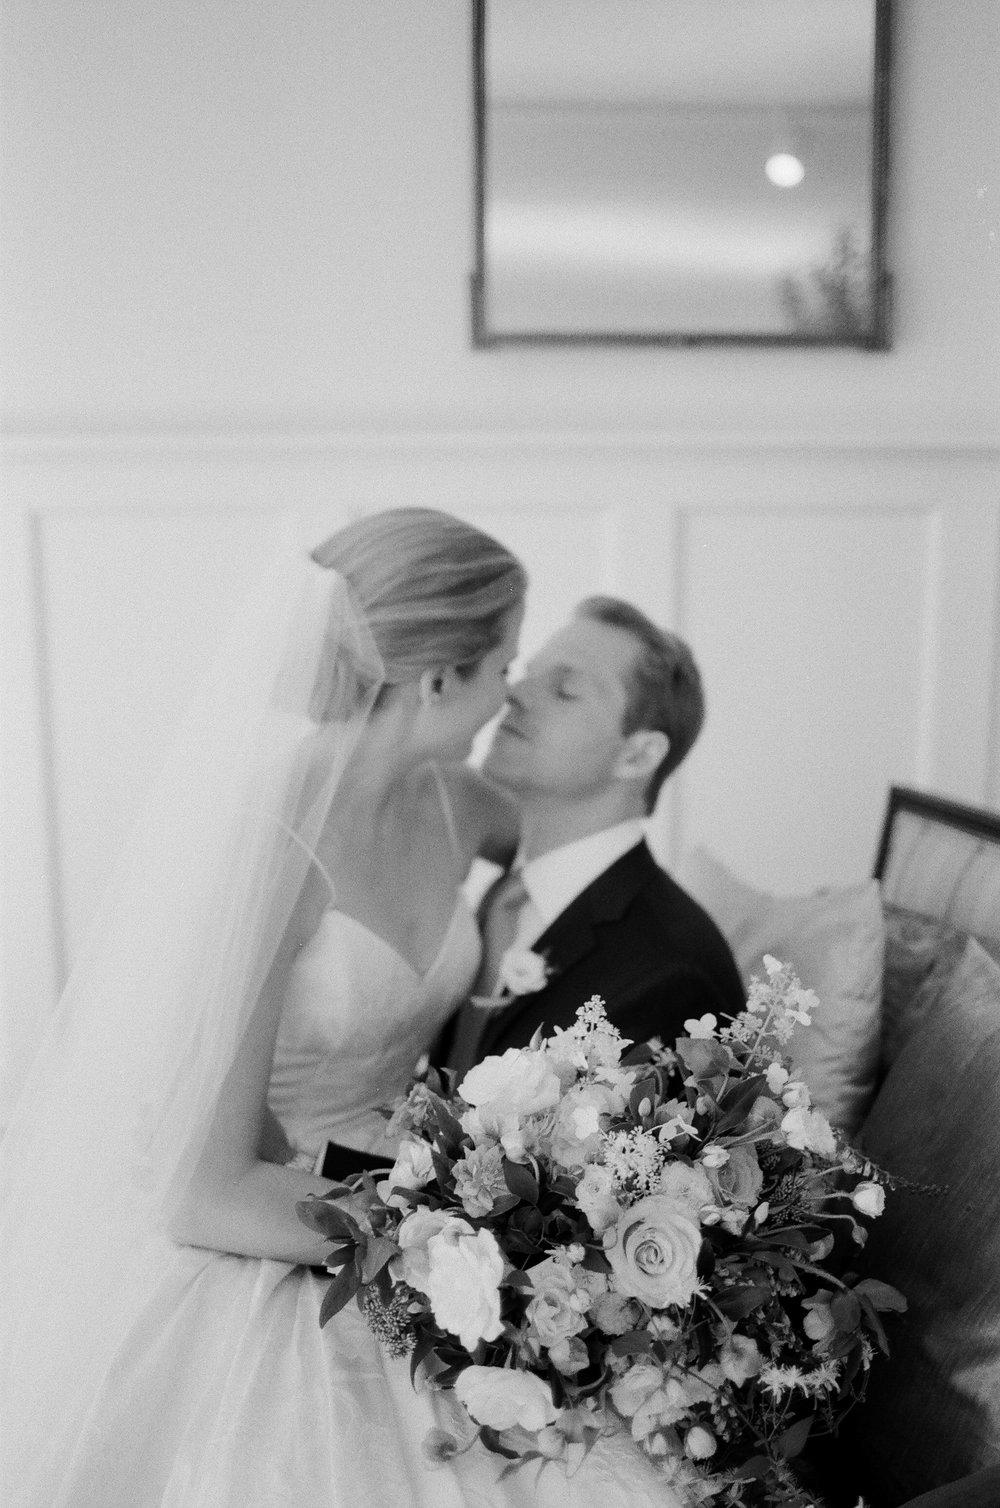 Connecticut-Wedding-8-Jen-Huang-20170909-KB-549-Jen_Huang-000021910035.jpg